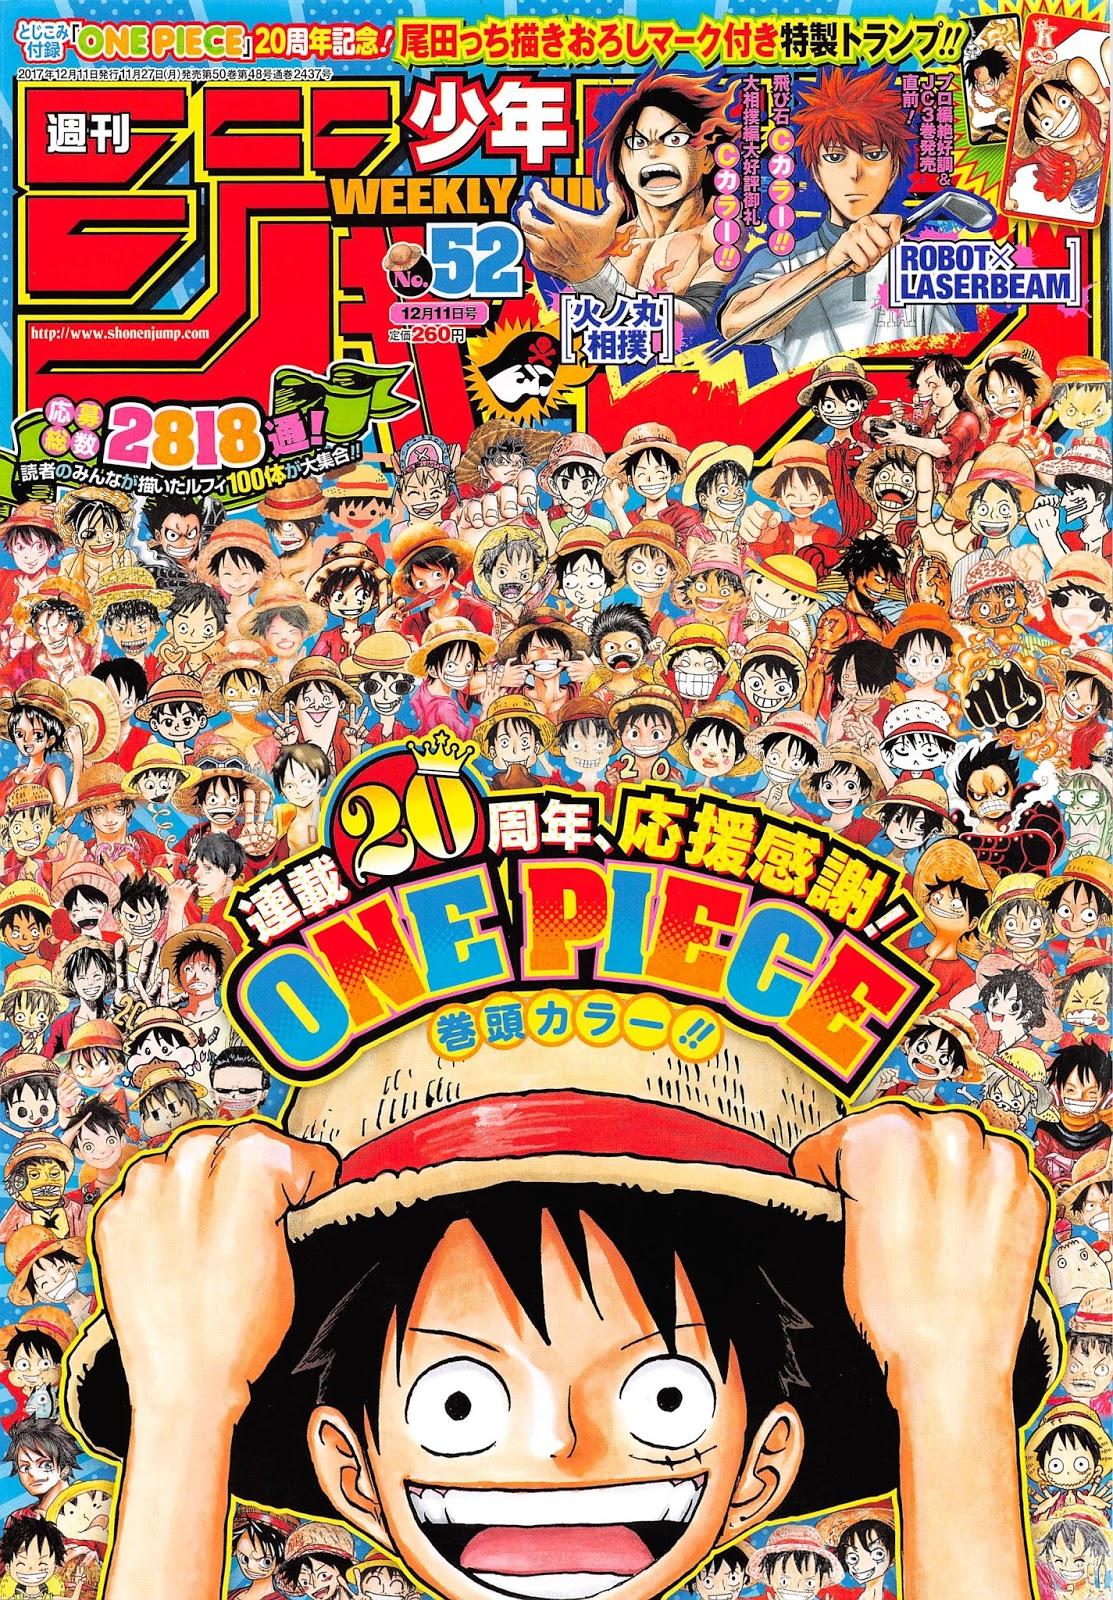 Yuragi sou no yuuna san serie completa capitulo 11 sub en esp - 4 9